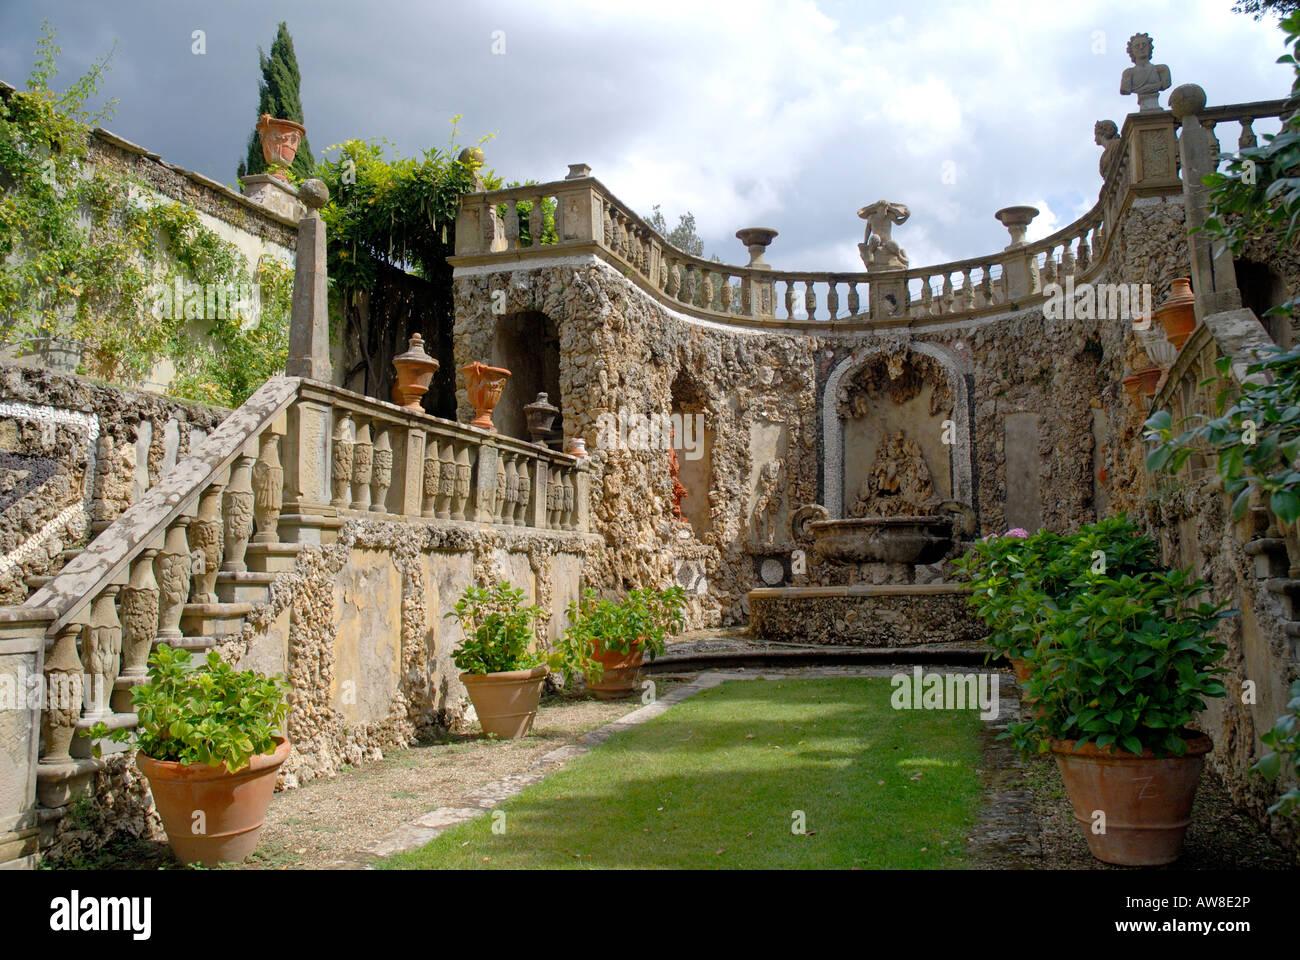 Gardens of the Villa Gamberaia at Settignano, Florence, Tuscany ...